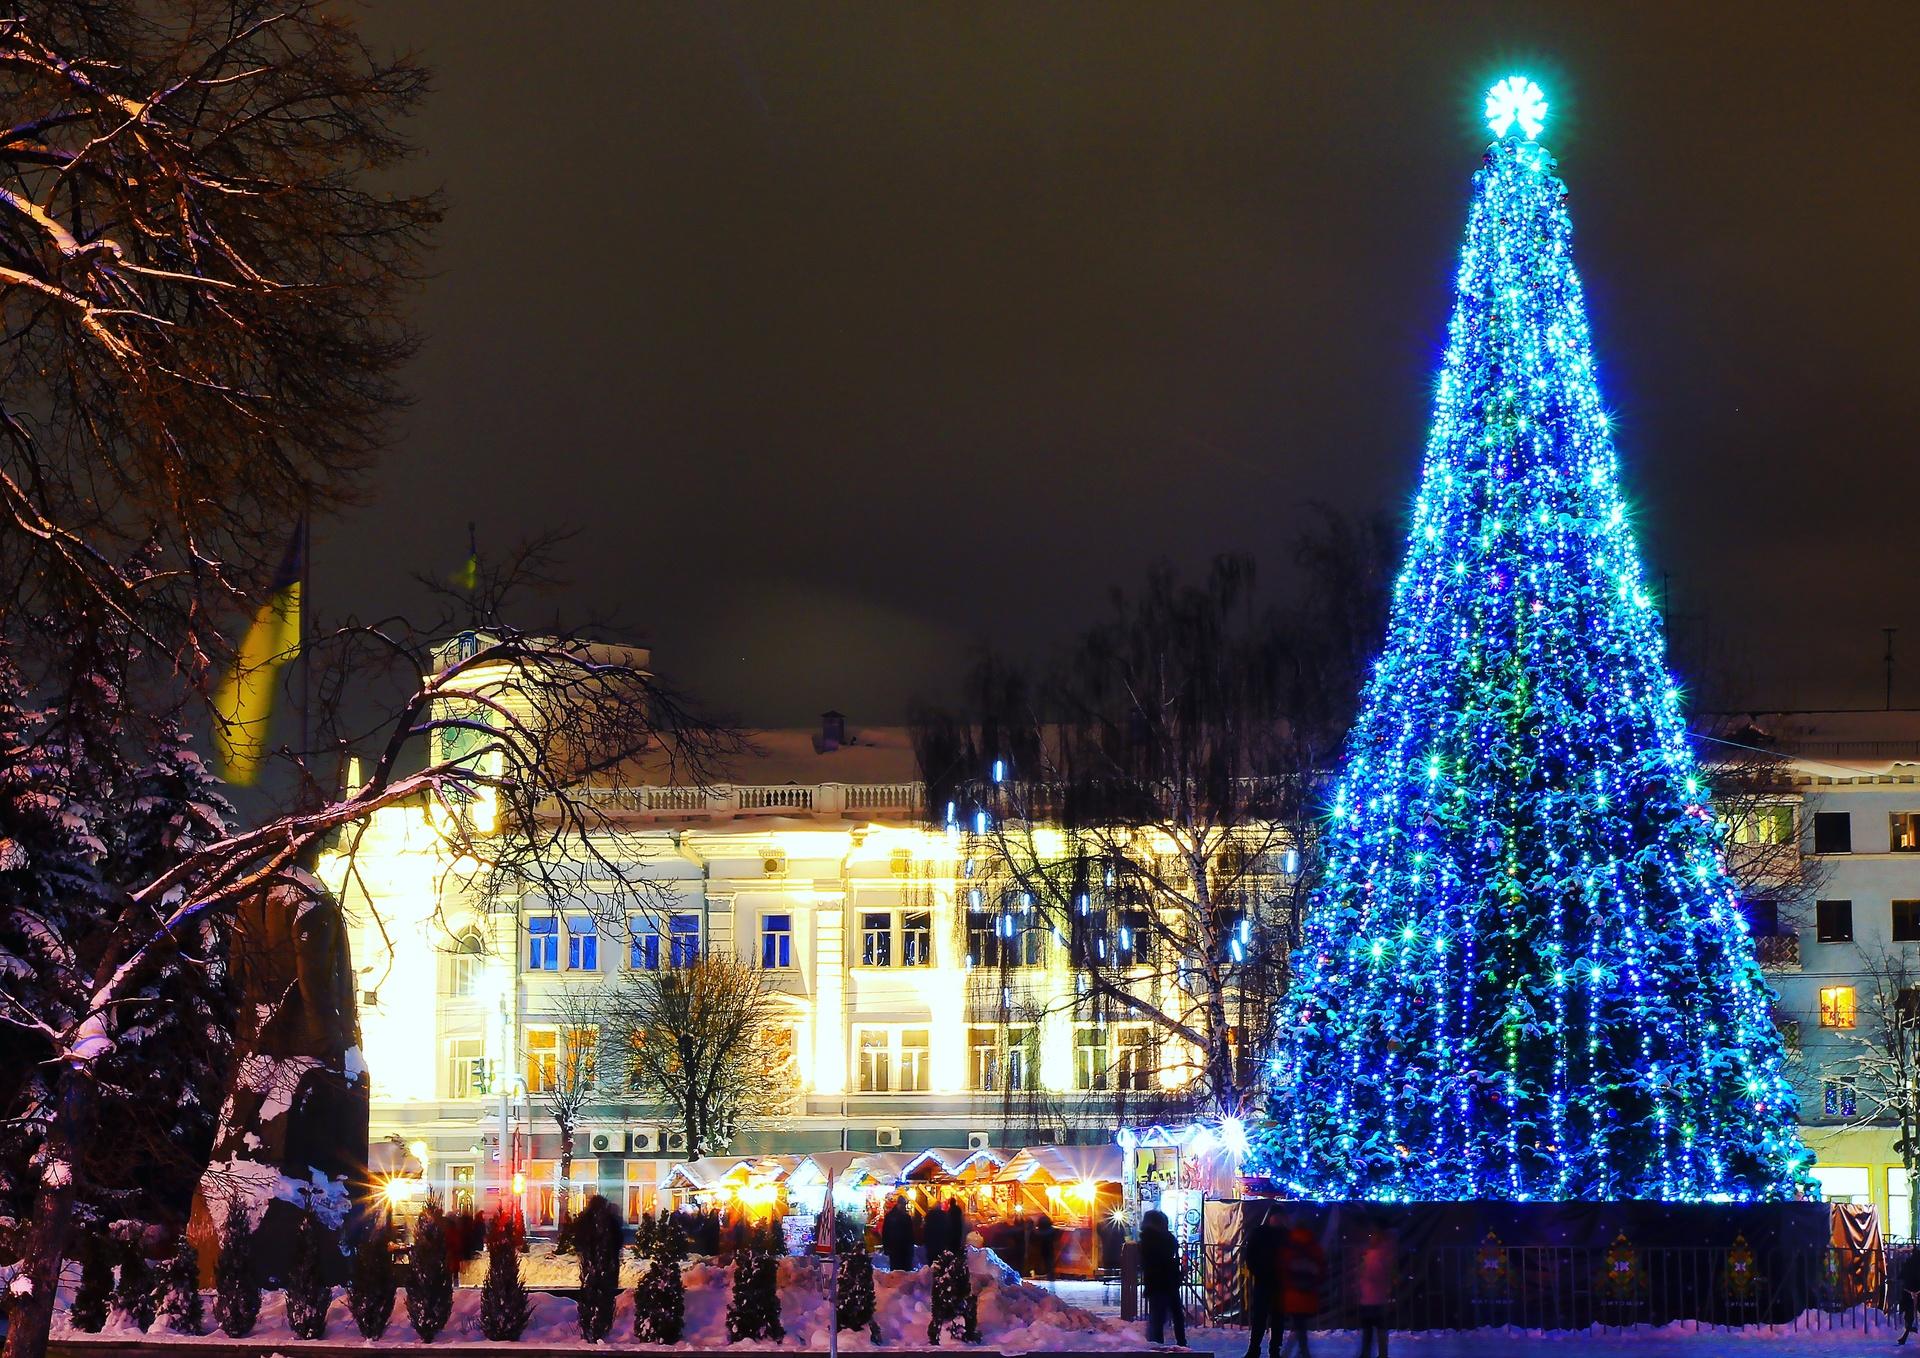 Holiday mood | vetal.davydov, city, winter, travel